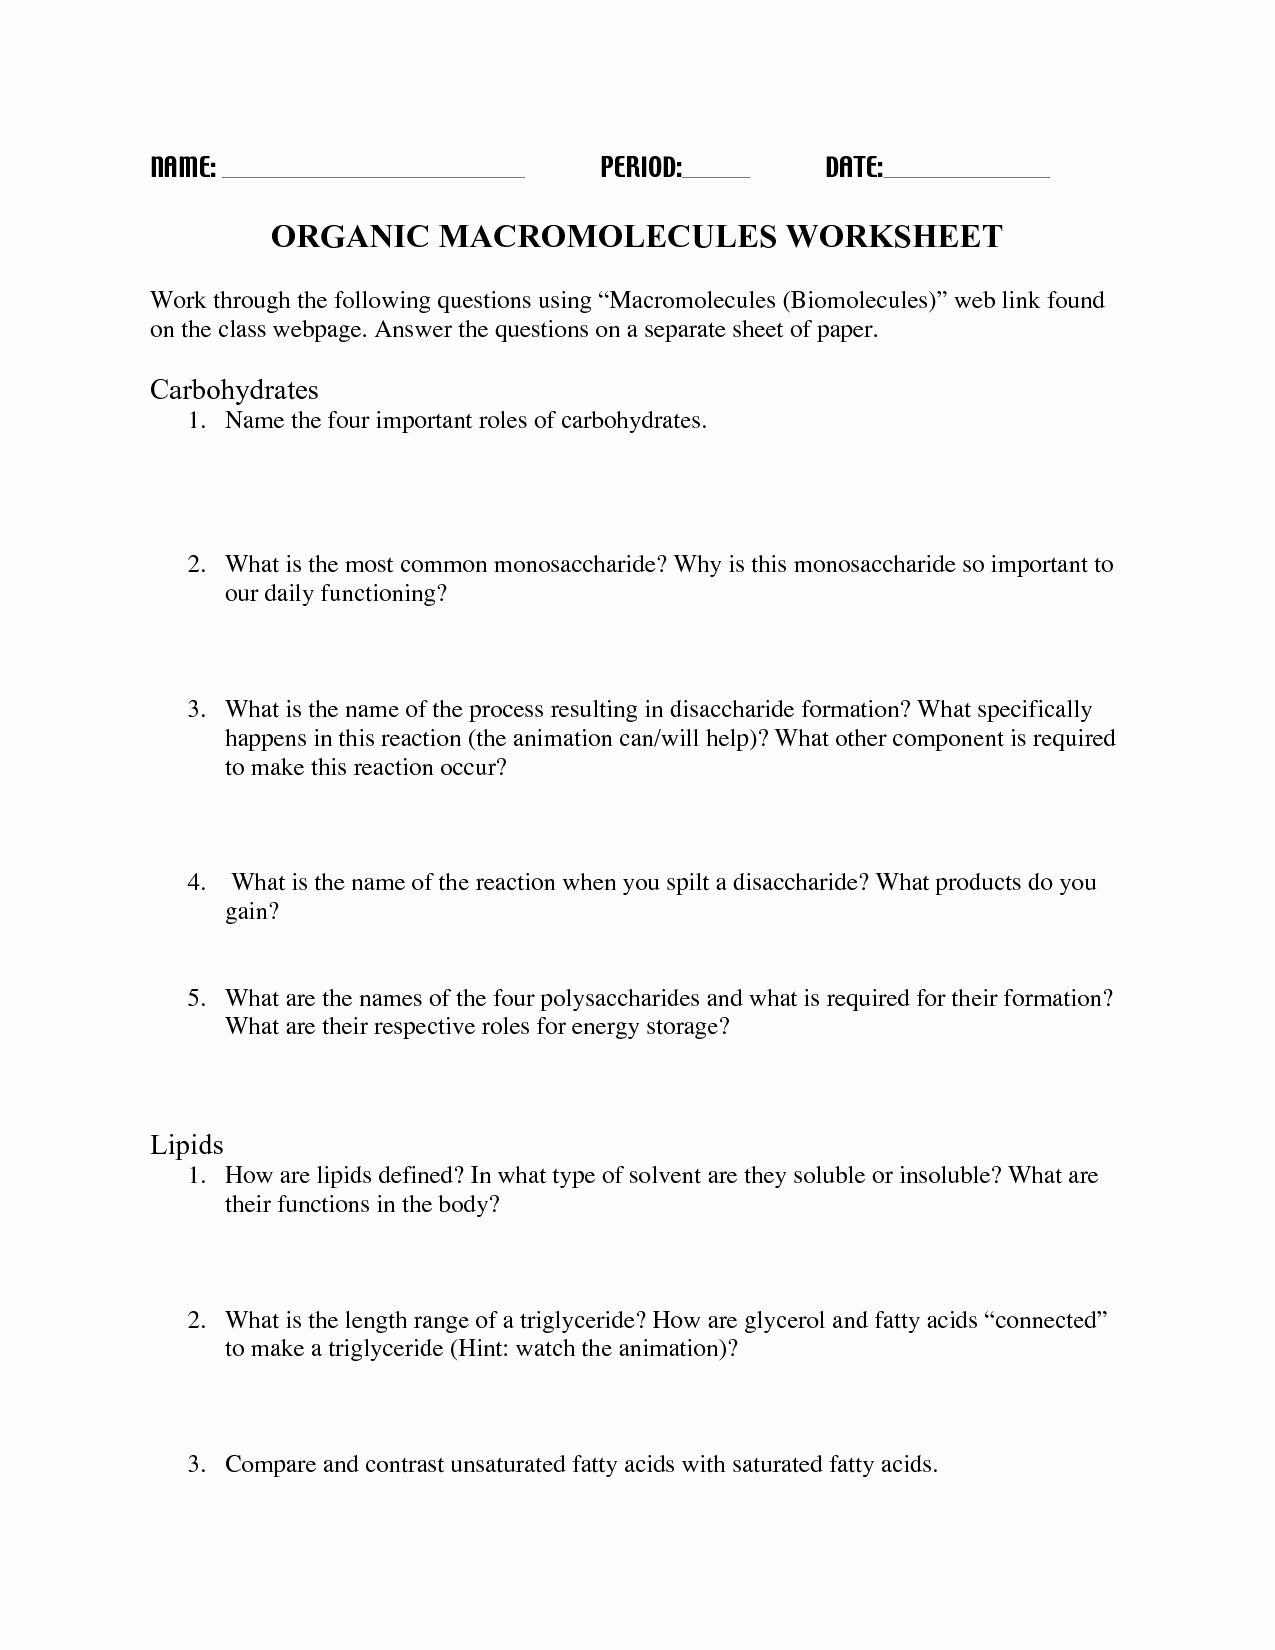 Organic Molecules Worksheet Answer Key Inspirational 14